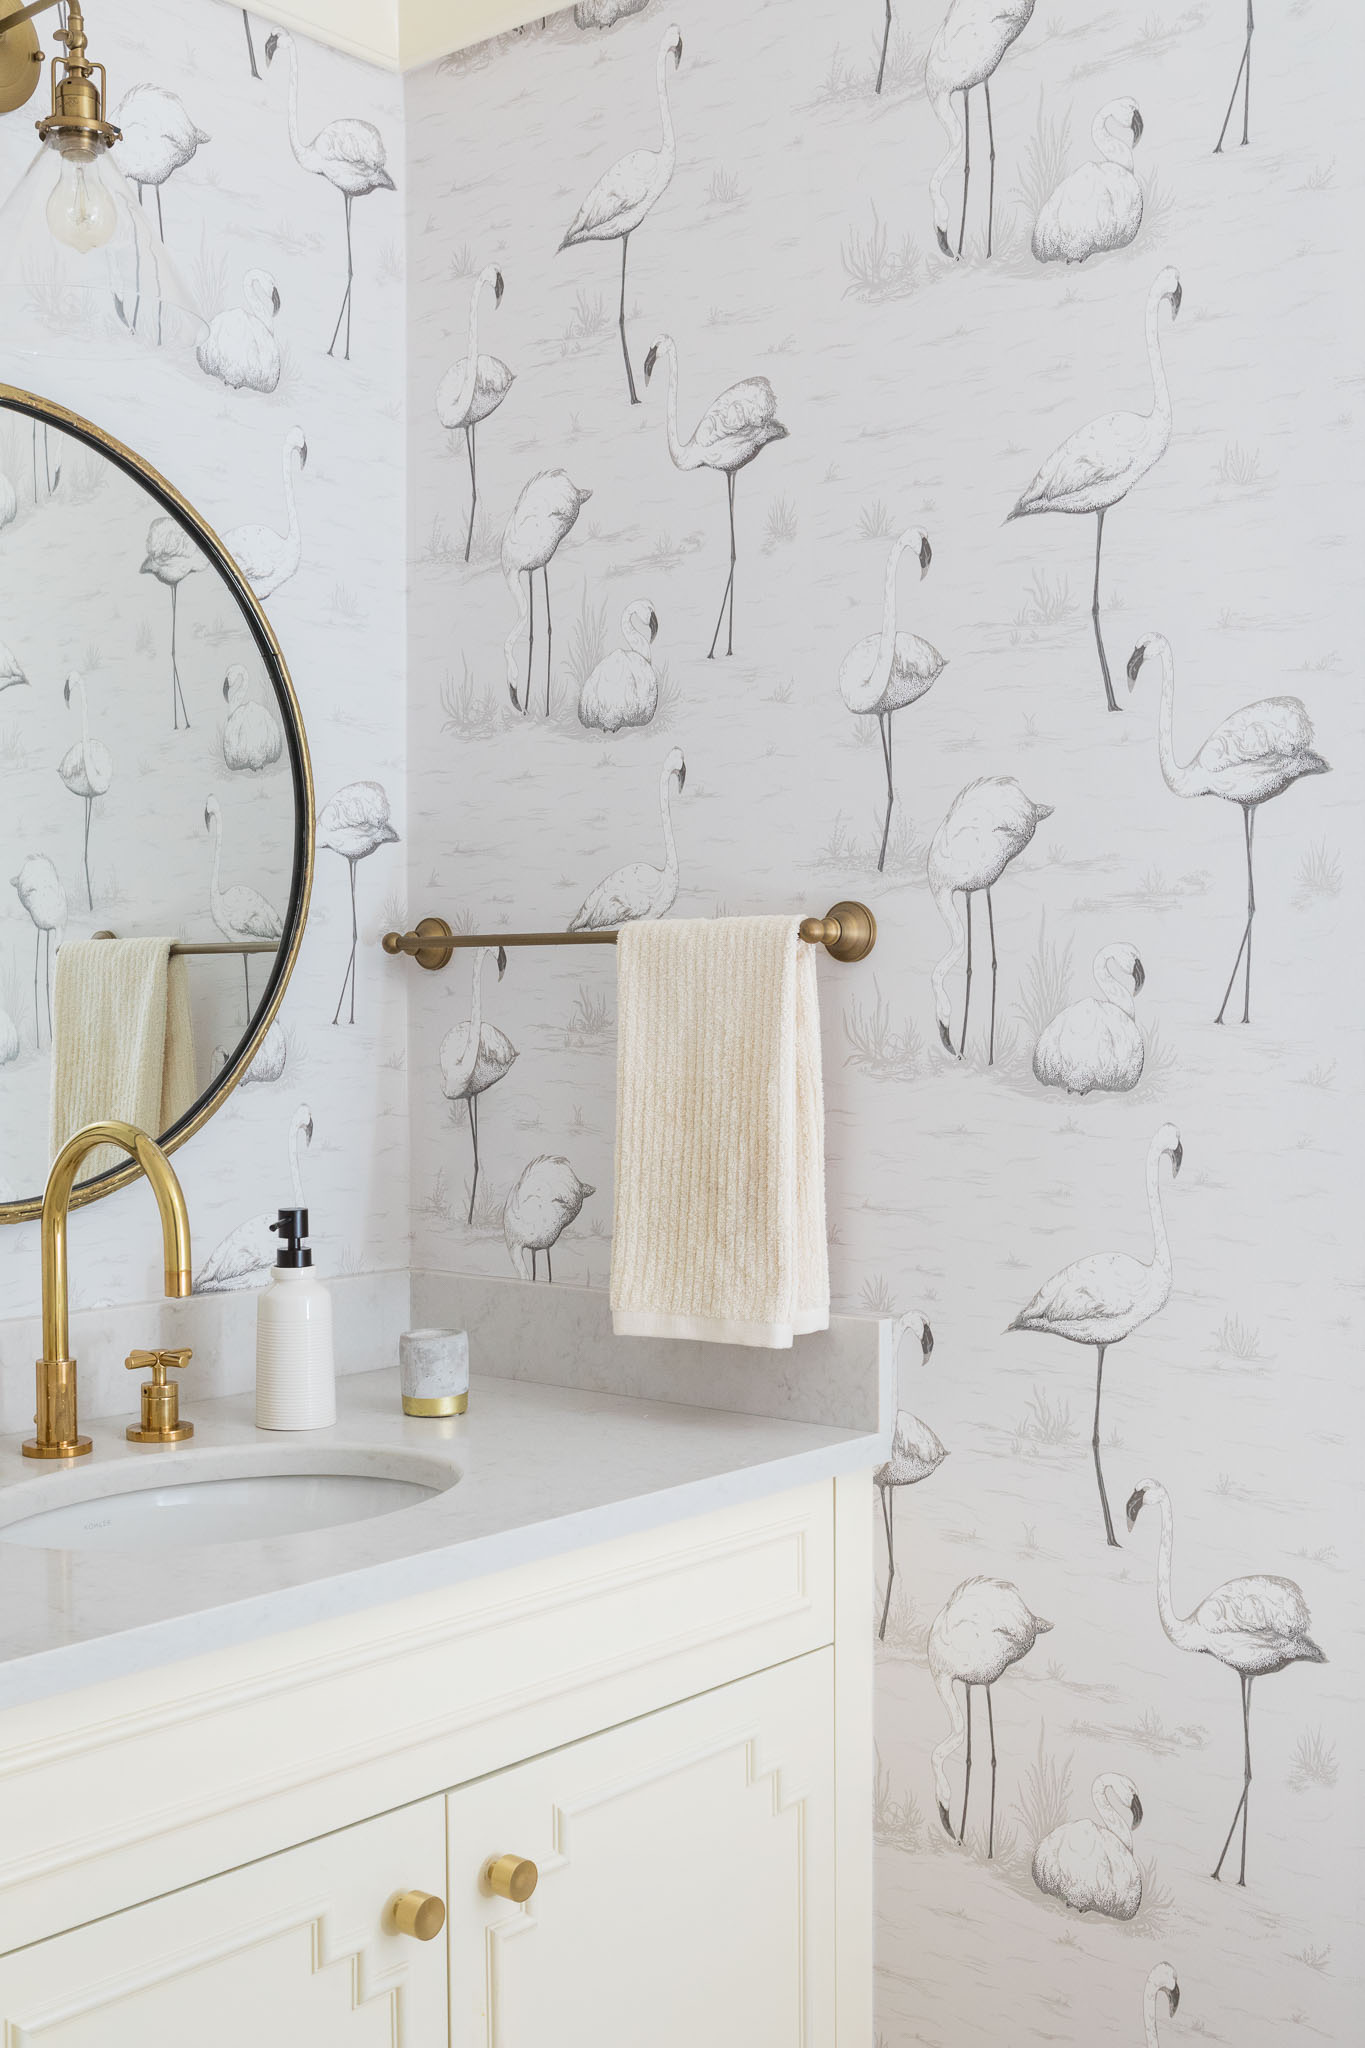 bathroom-powder room-wallpaper-flamingoes-brass accents.jpg